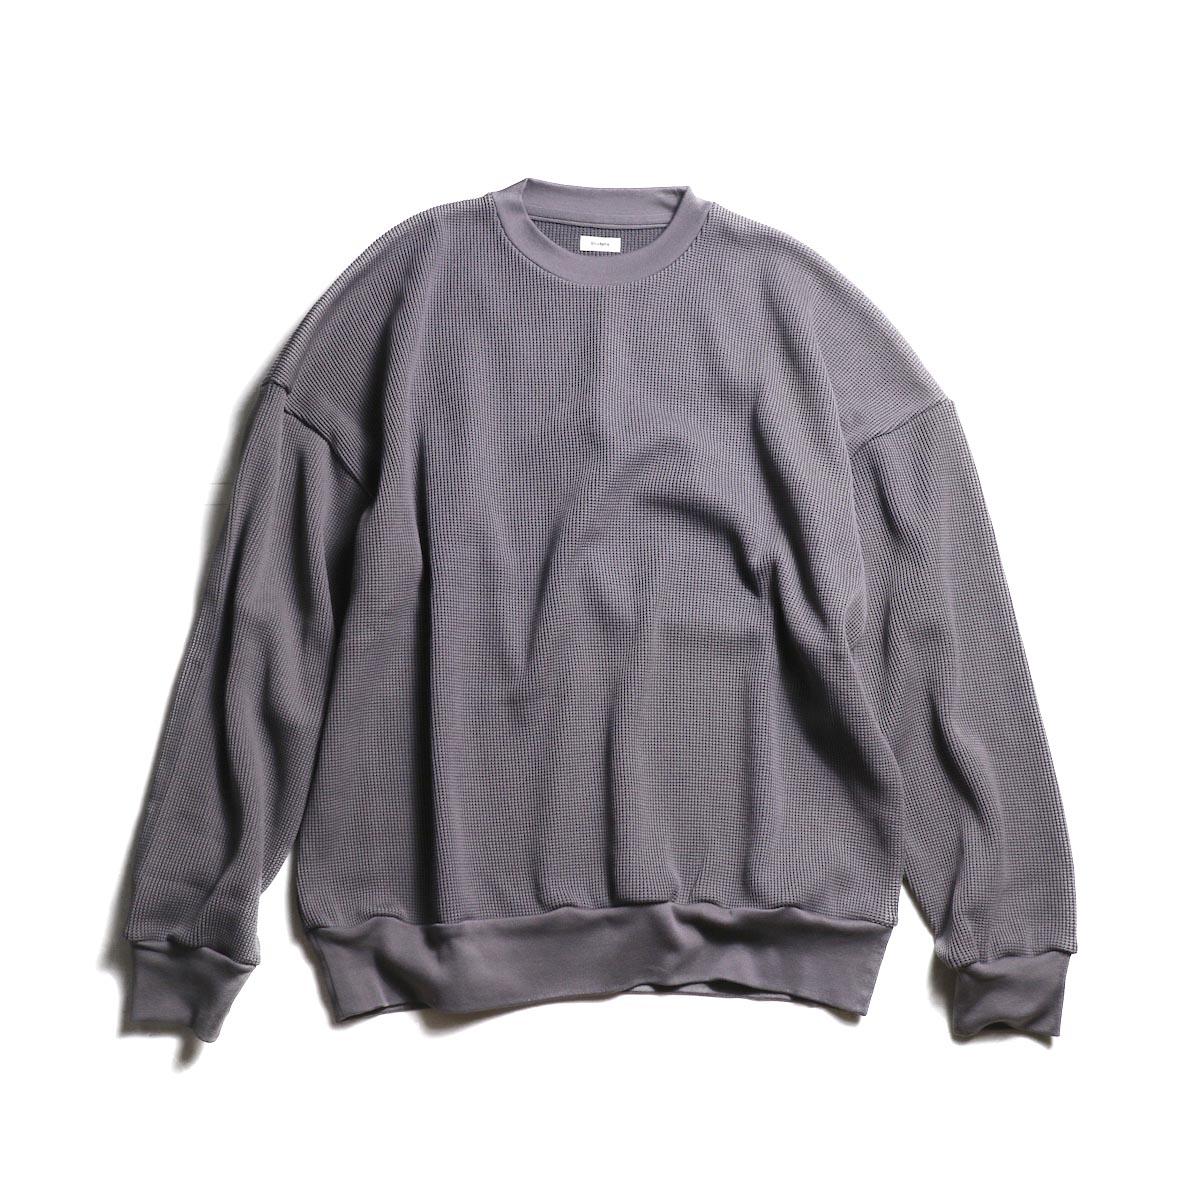 blurhms / Cotton Cupro Waffle Pullover L/S (PurpleGrey)正面